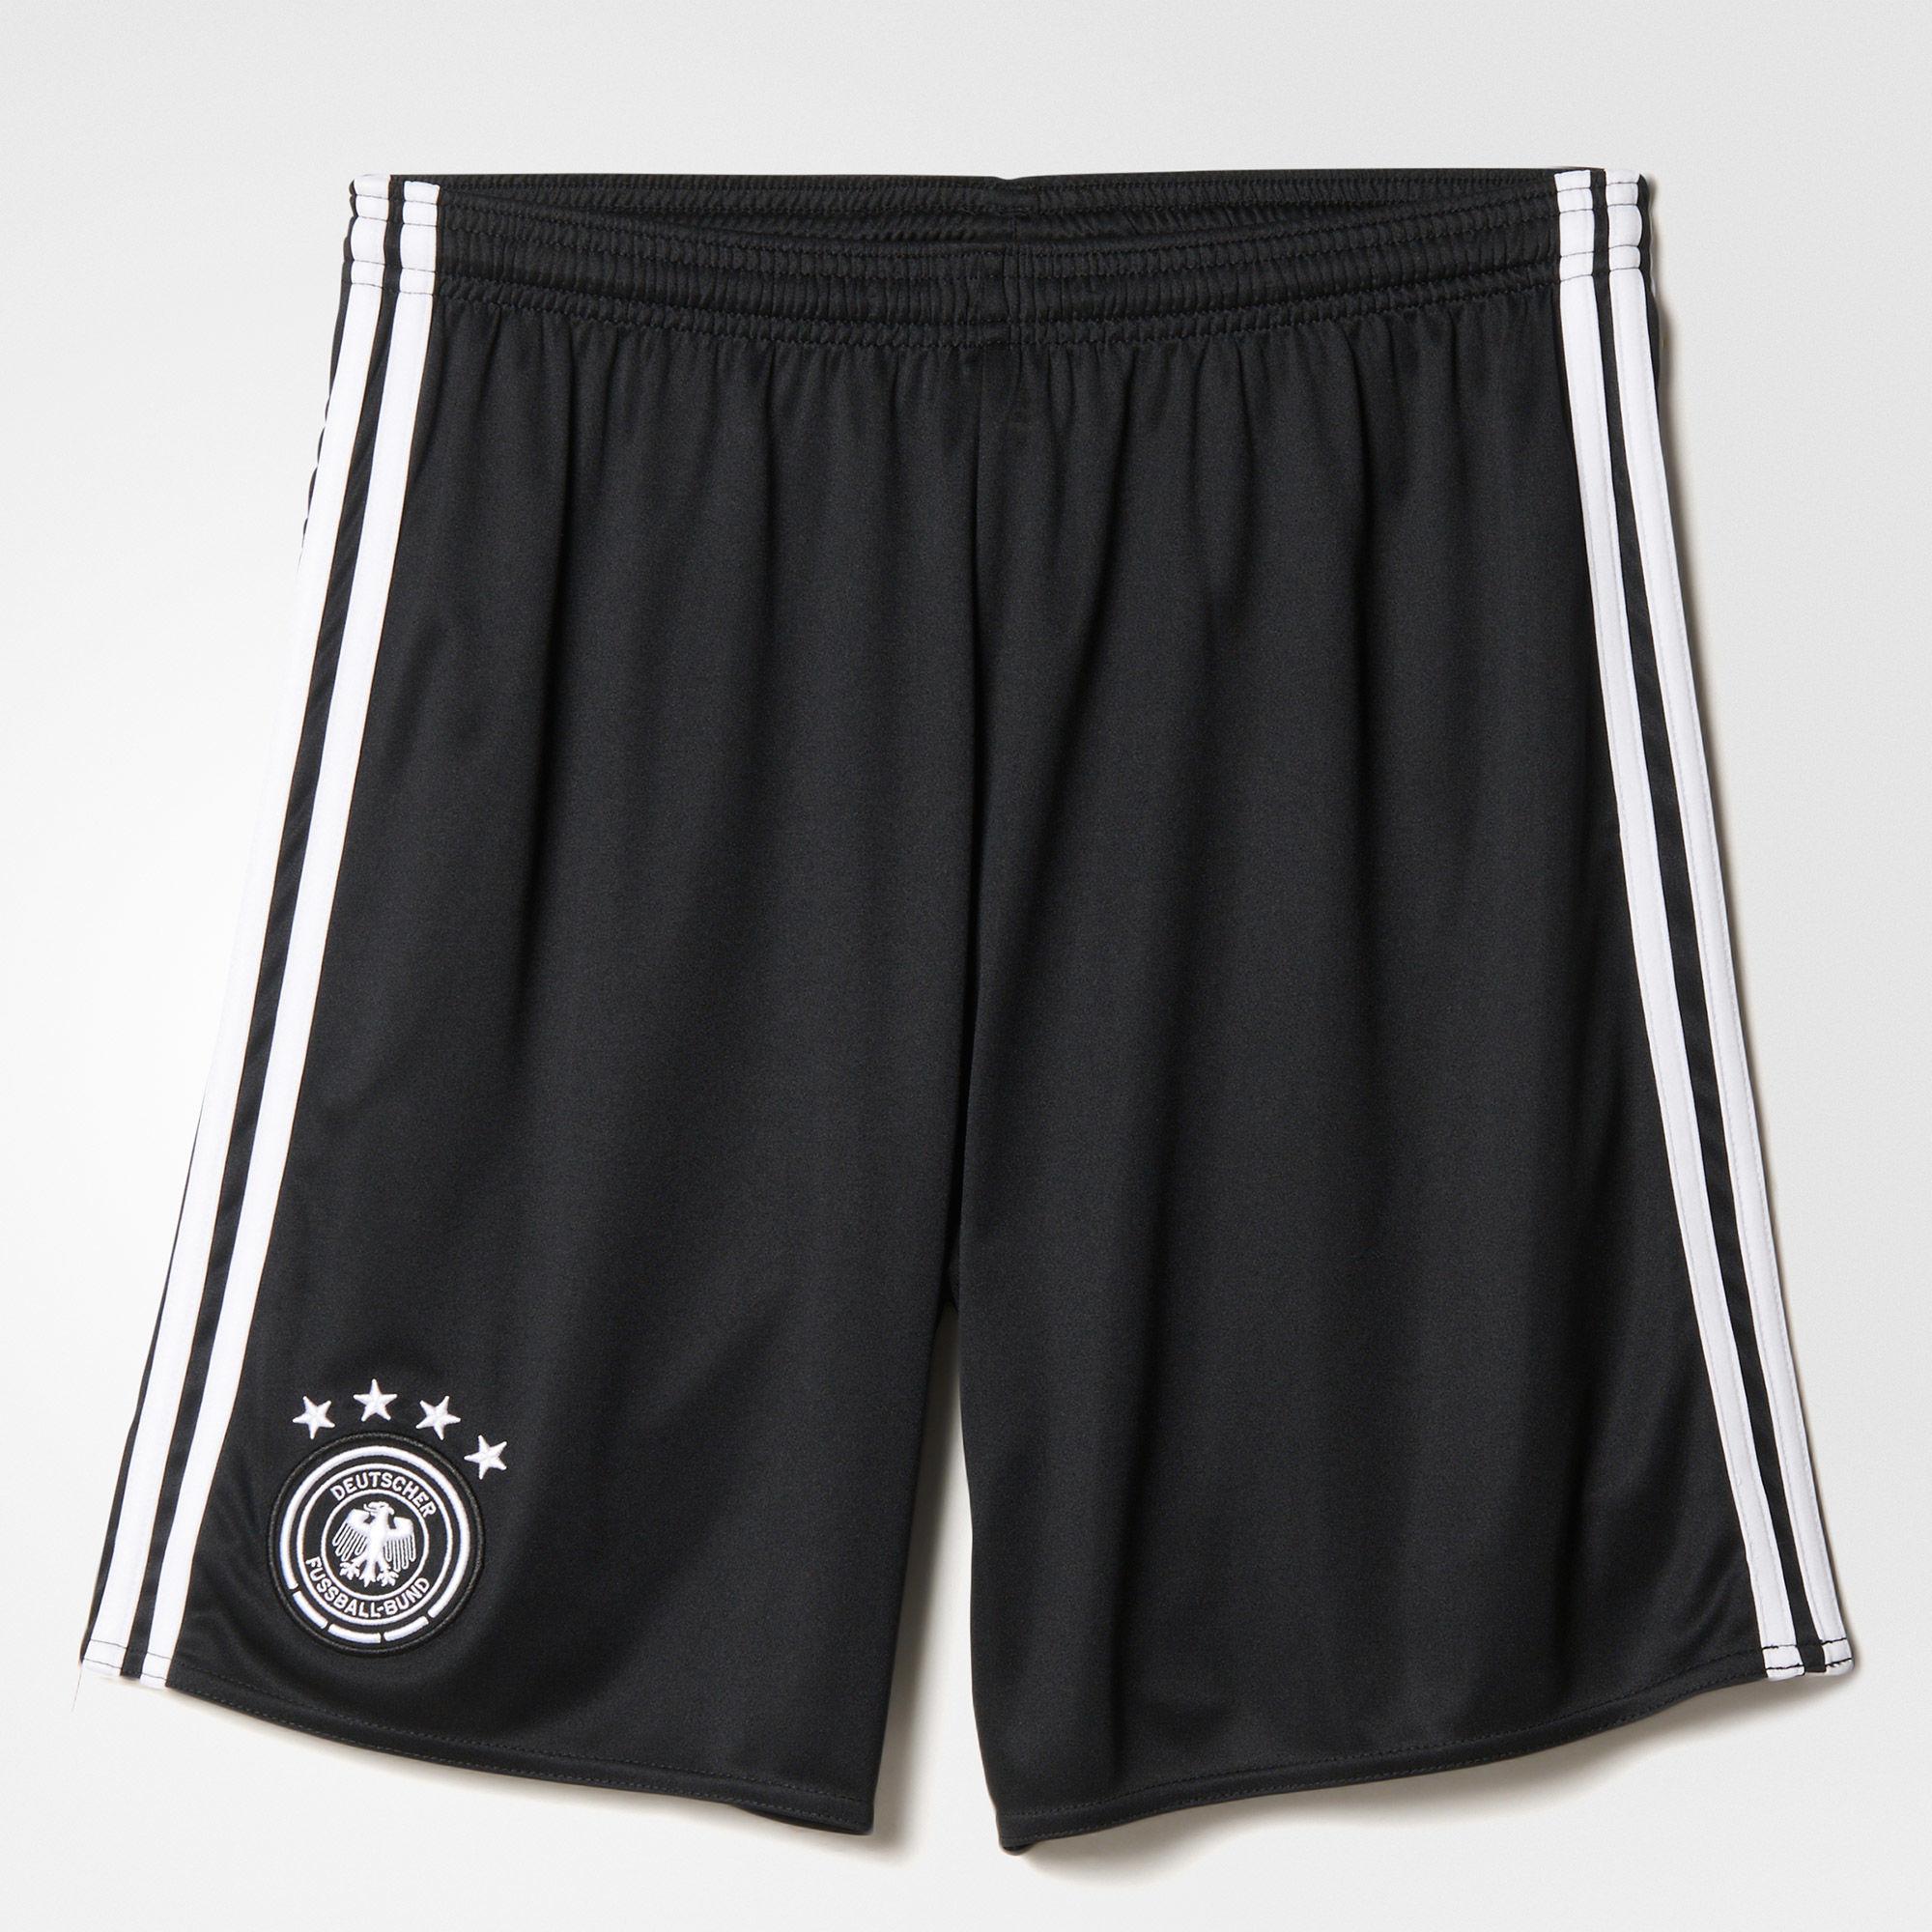 Herren Heimshorts UEFA EURO 2016 DFB Replica, BLACK/WHITE, M